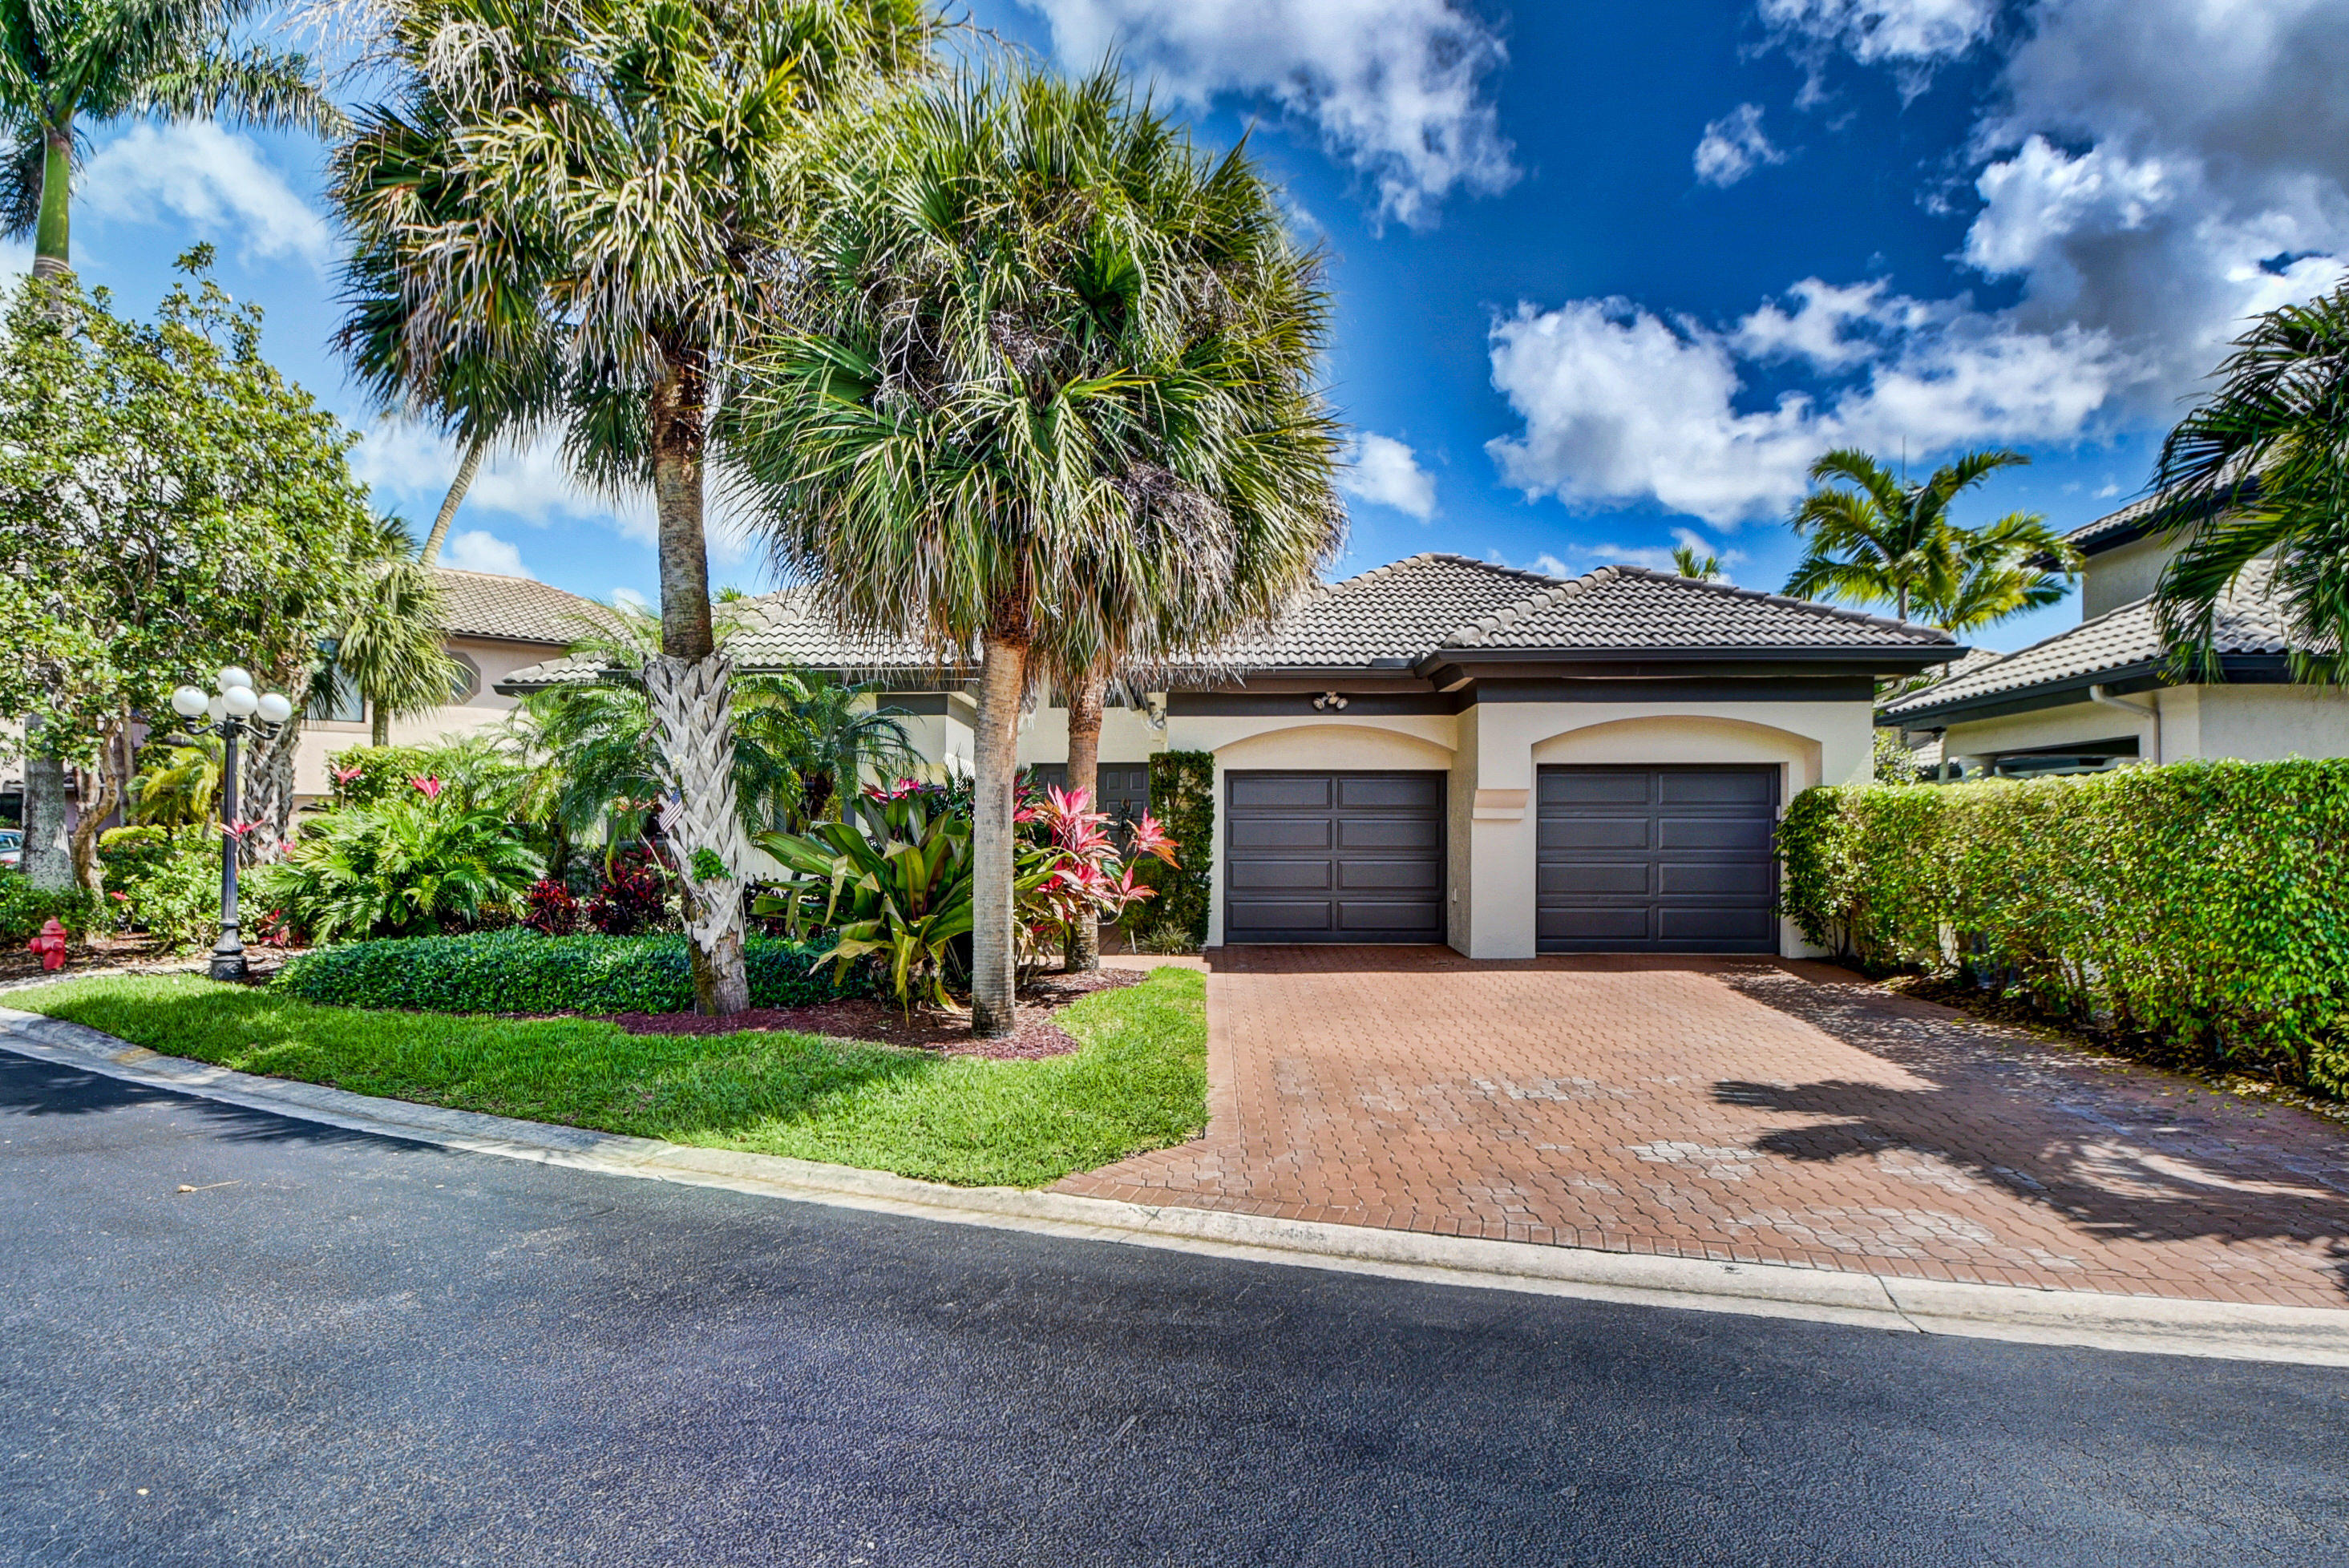 Photo of 22710 El Dorado Drive, Boca Raton, FL 33433